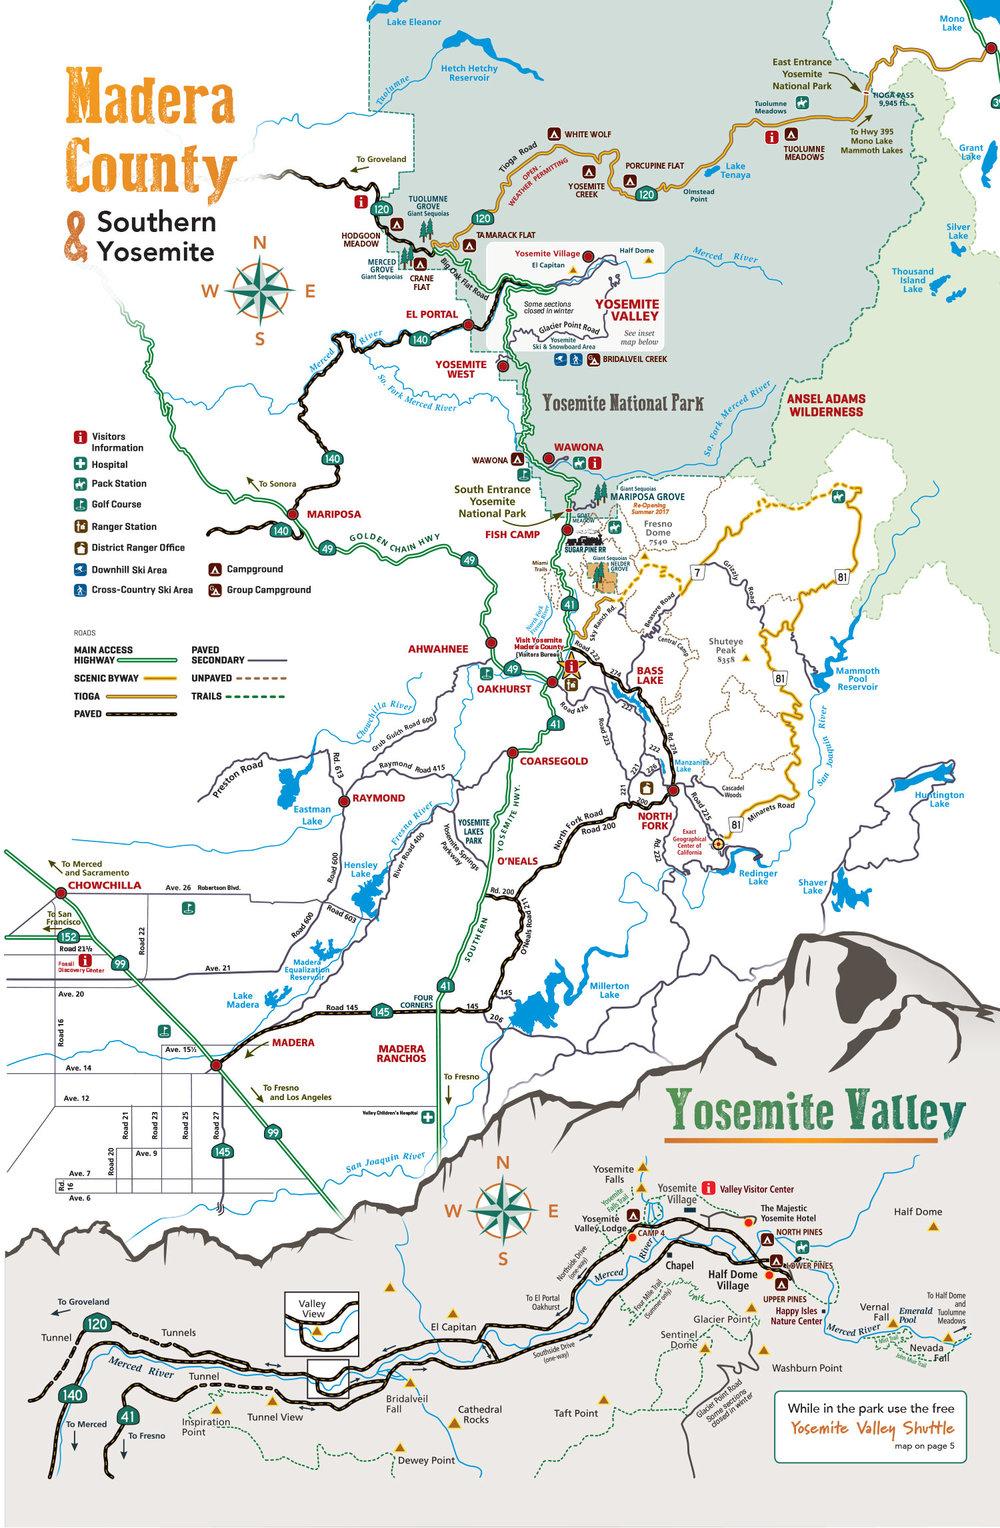 2017-vymc-madera-southern-yosemite-map.jpg